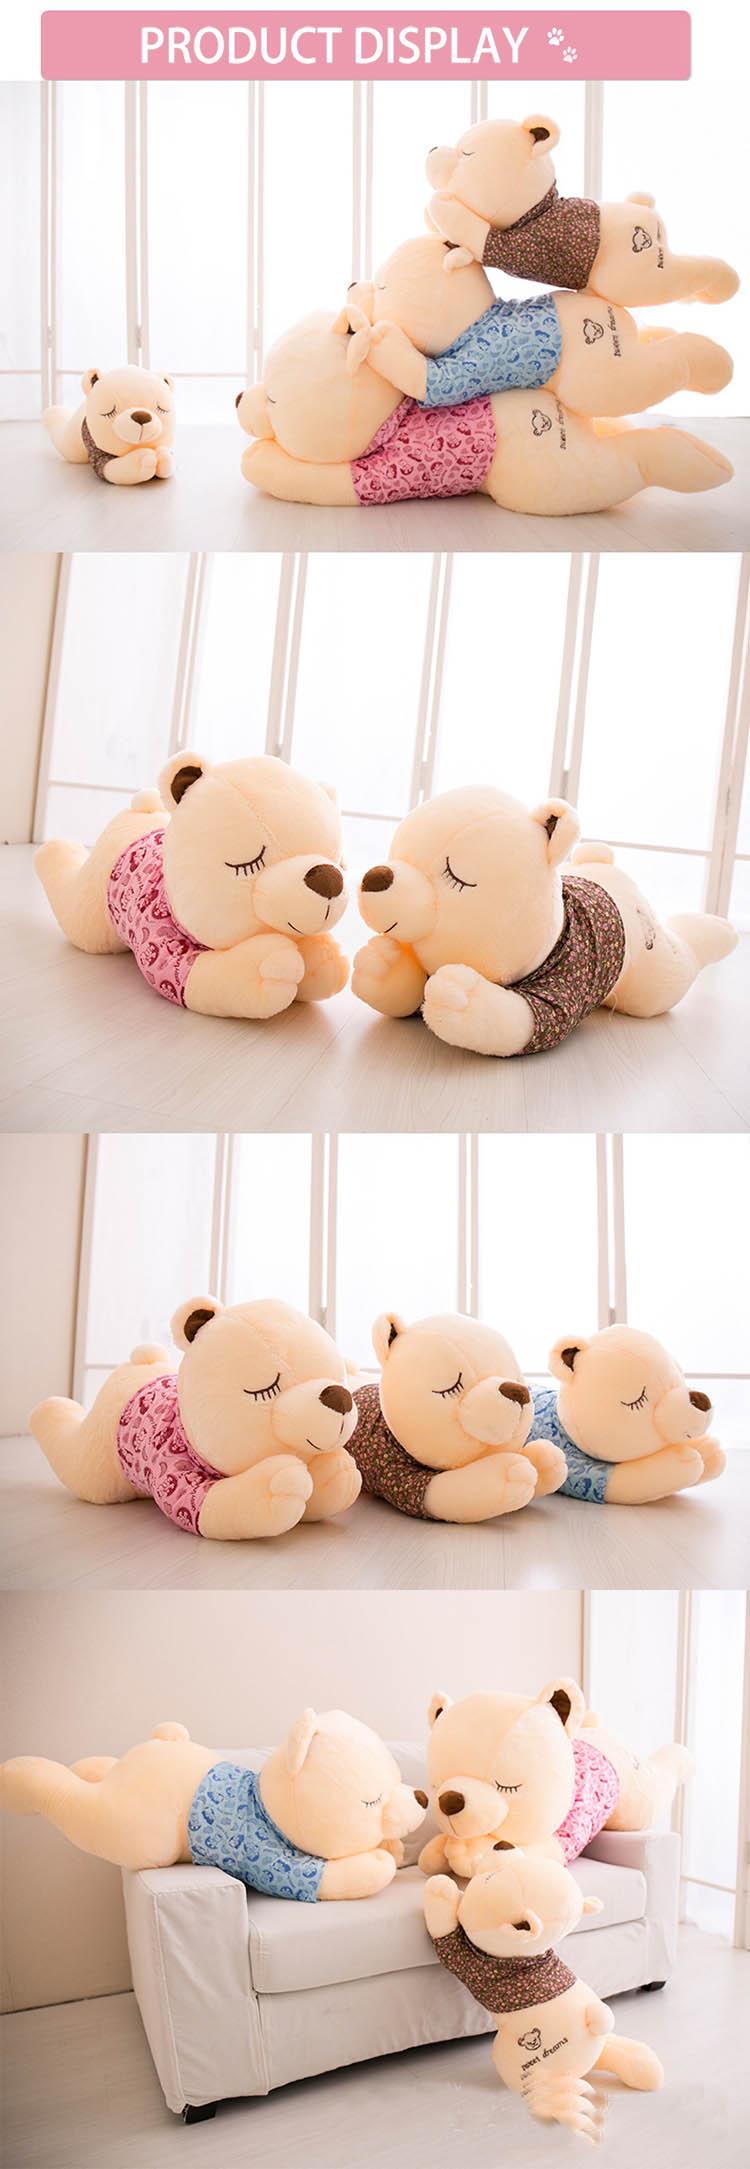 Á£large Doll Cute Hug Bear Raccoon Kawaii Fashion Cartoon Bear 0 12 Years Old Children Sleep Teddy Bear Plush Toy 2018 New A110